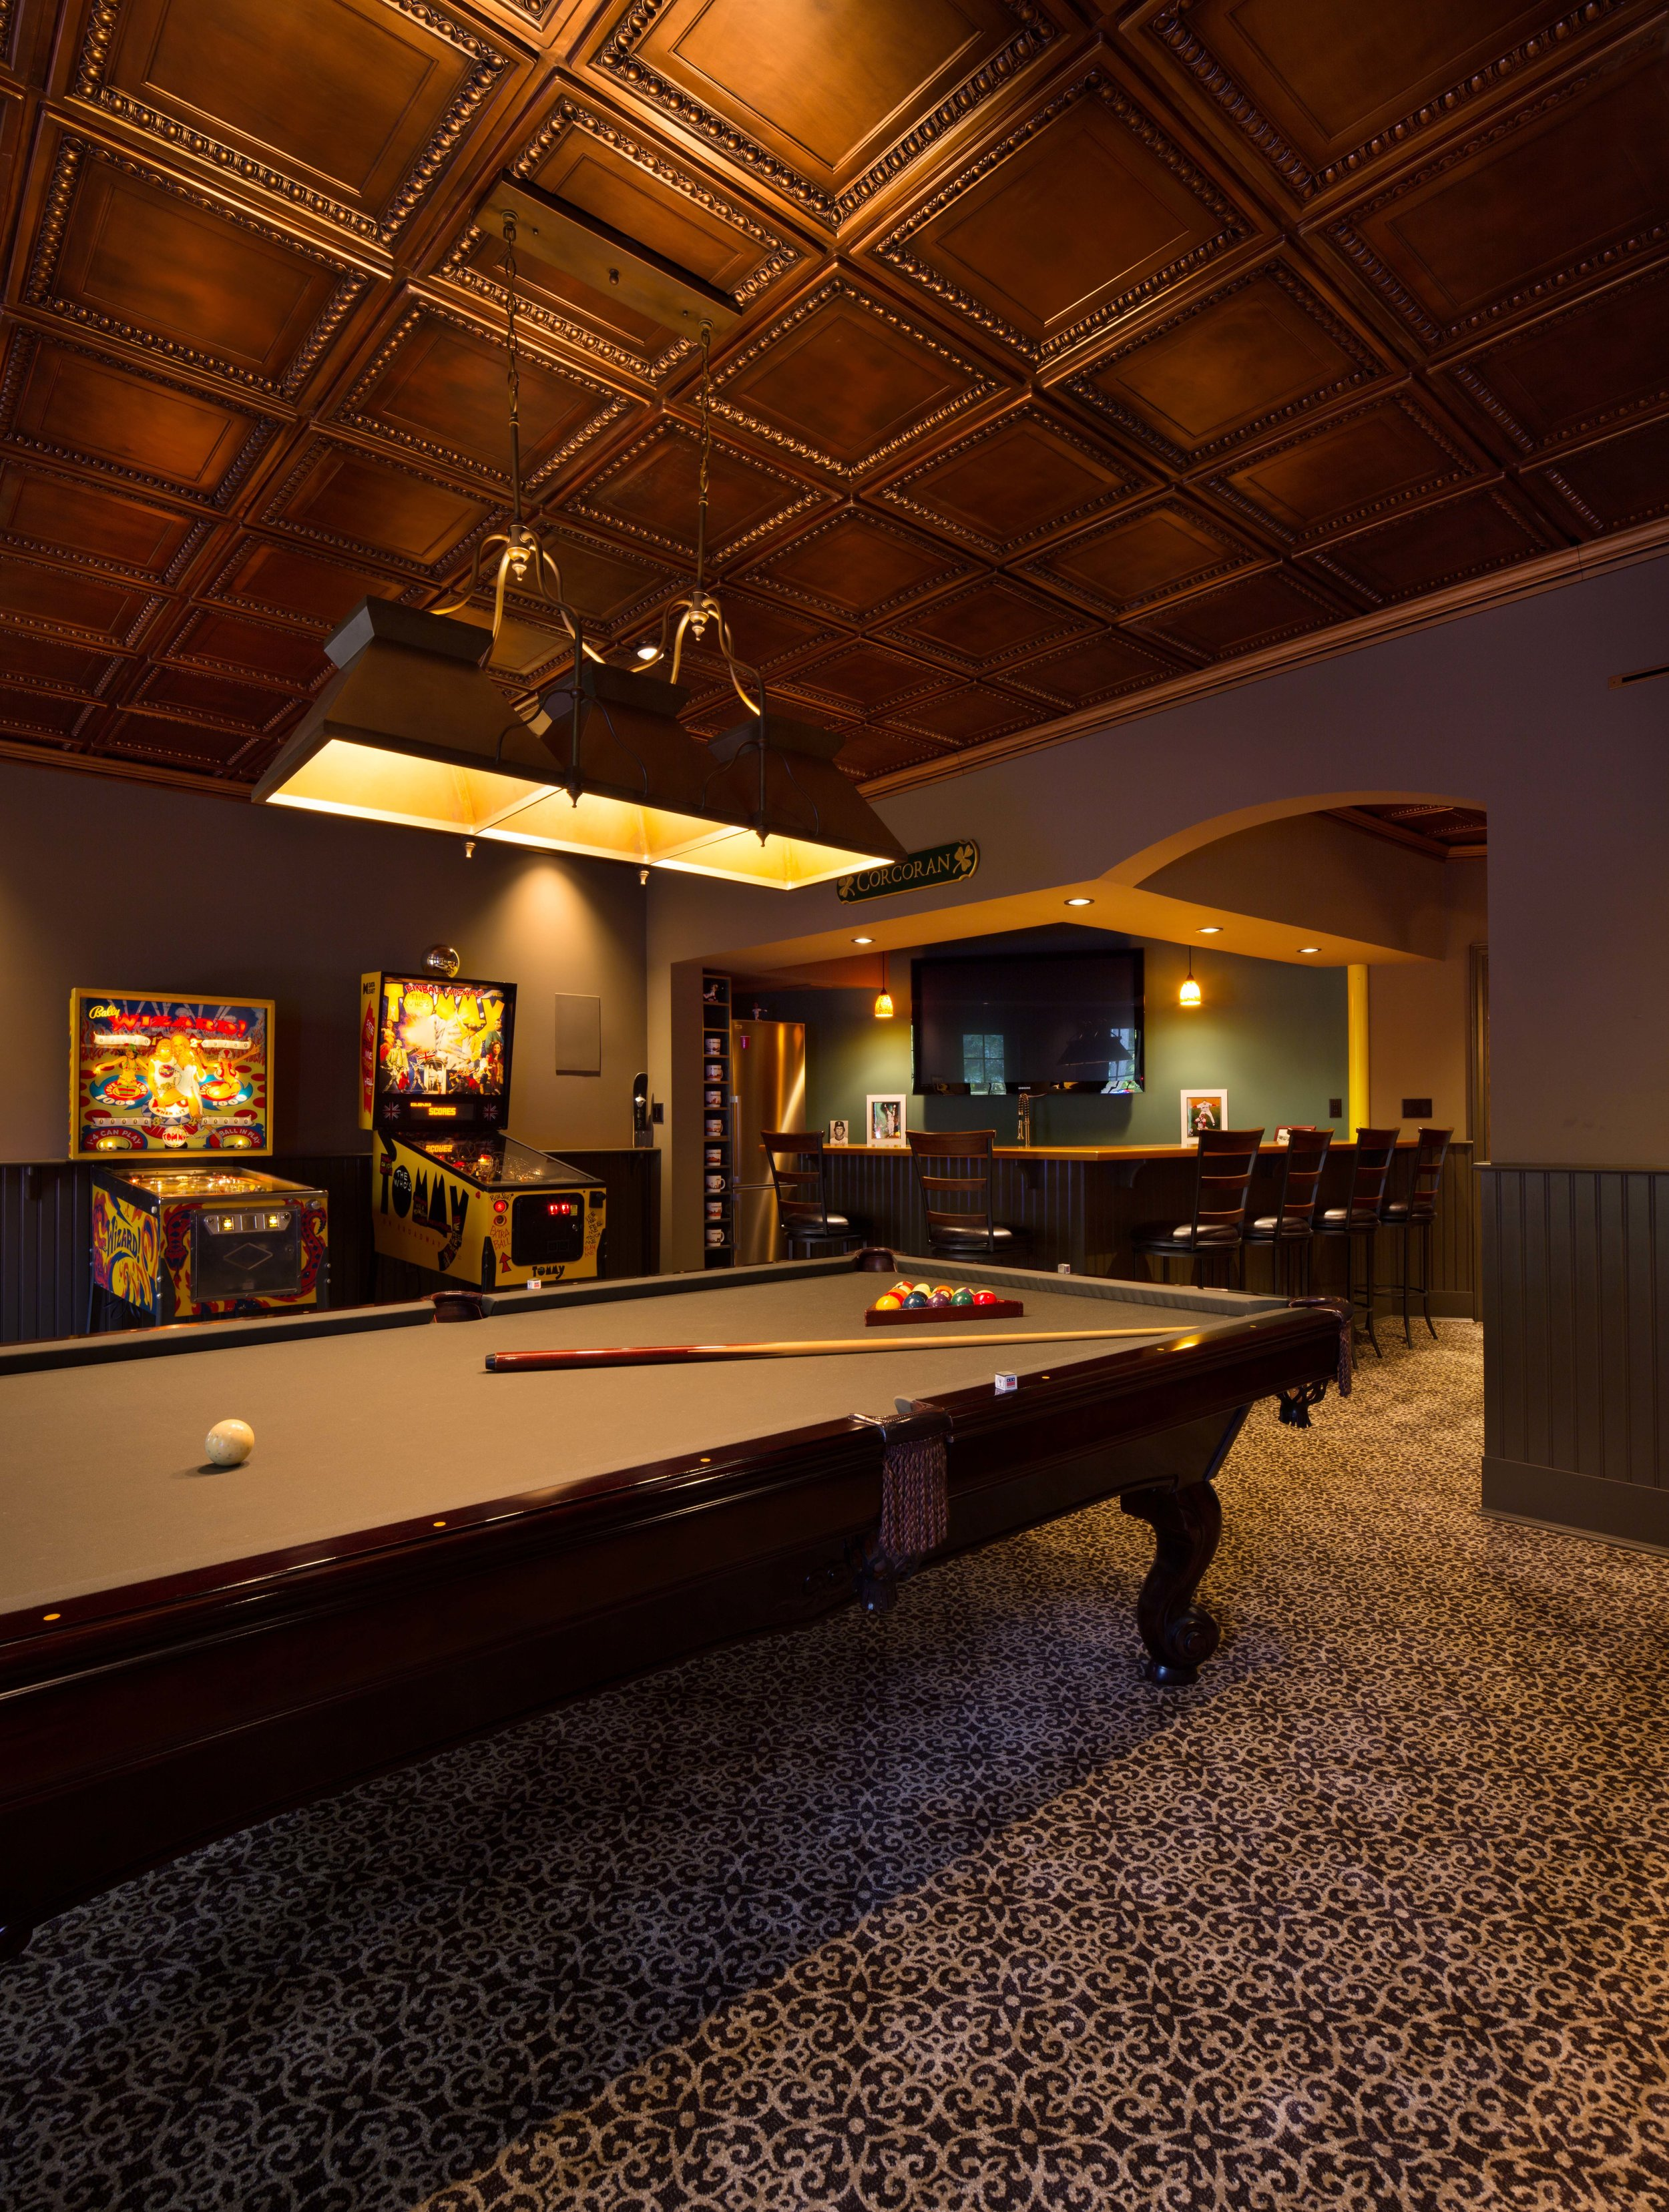 Corcoran-2617 Pool Room Stitch.jpg